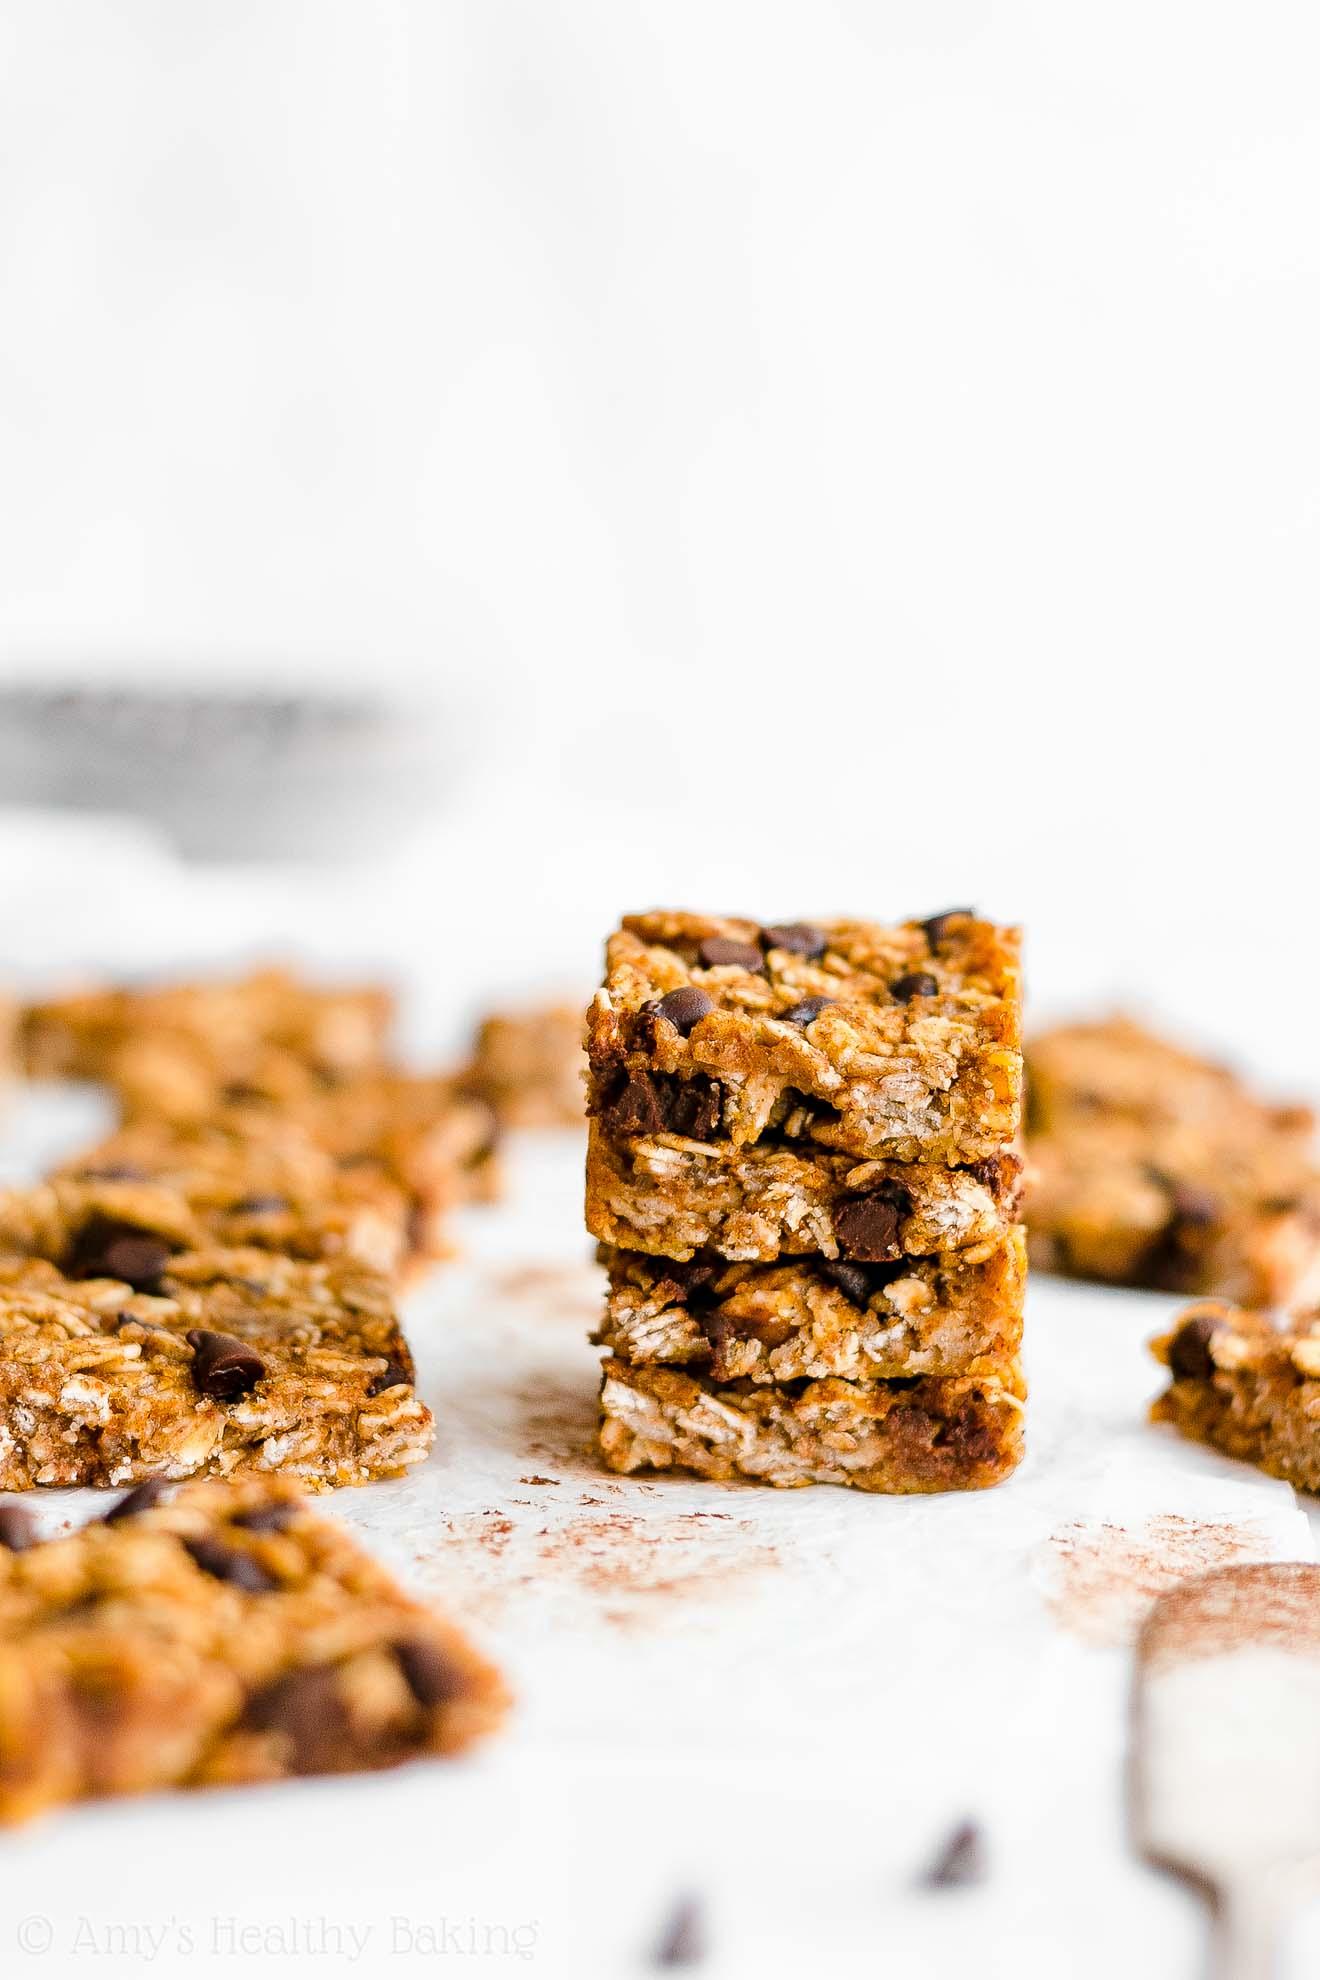 Best Easy Healthy Gluten Free Low Calorie Pumpkin Chocolate Chip Granola Bar Bites